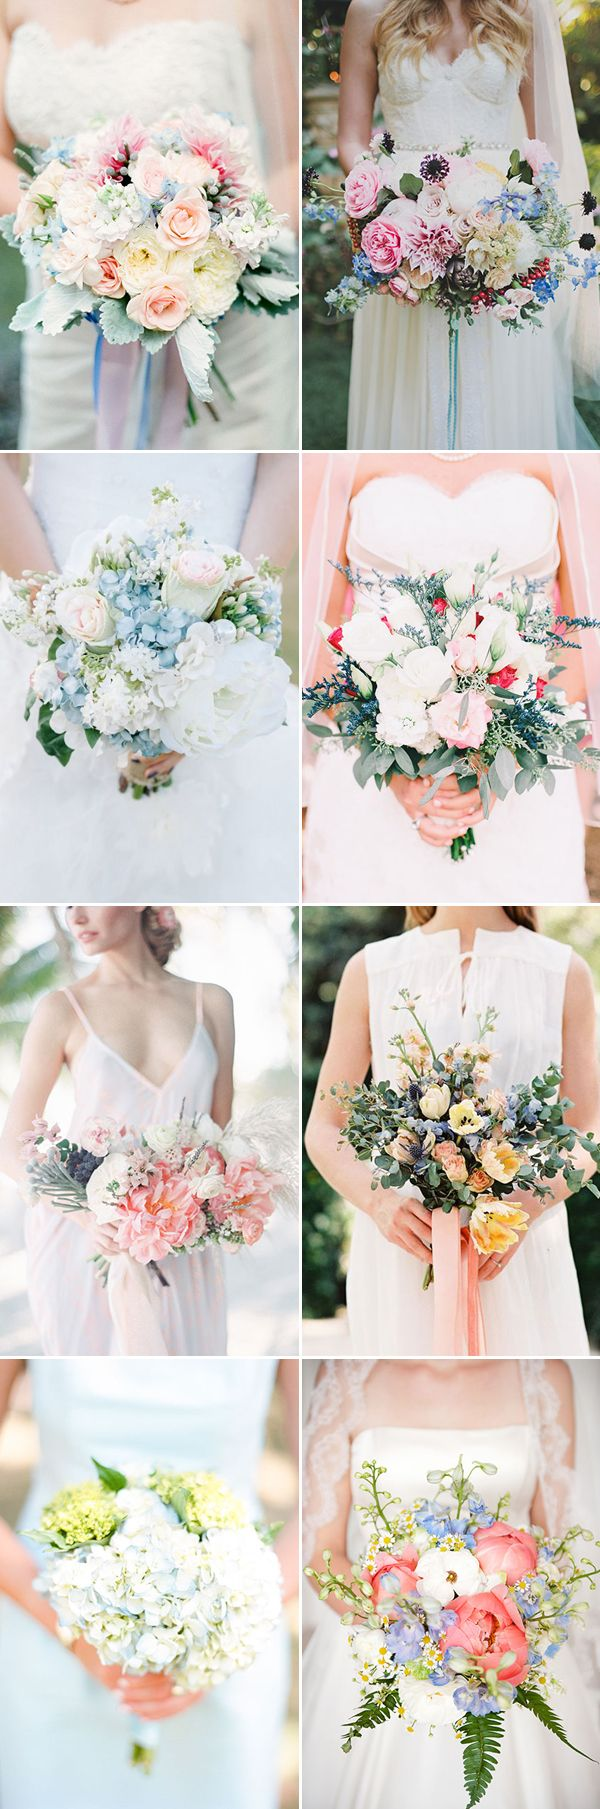 Sweet Arrangements Blue Spring Wedding Bouquet / http://www.himisspuff.com/spring-summer-wedding-bouquets/10/